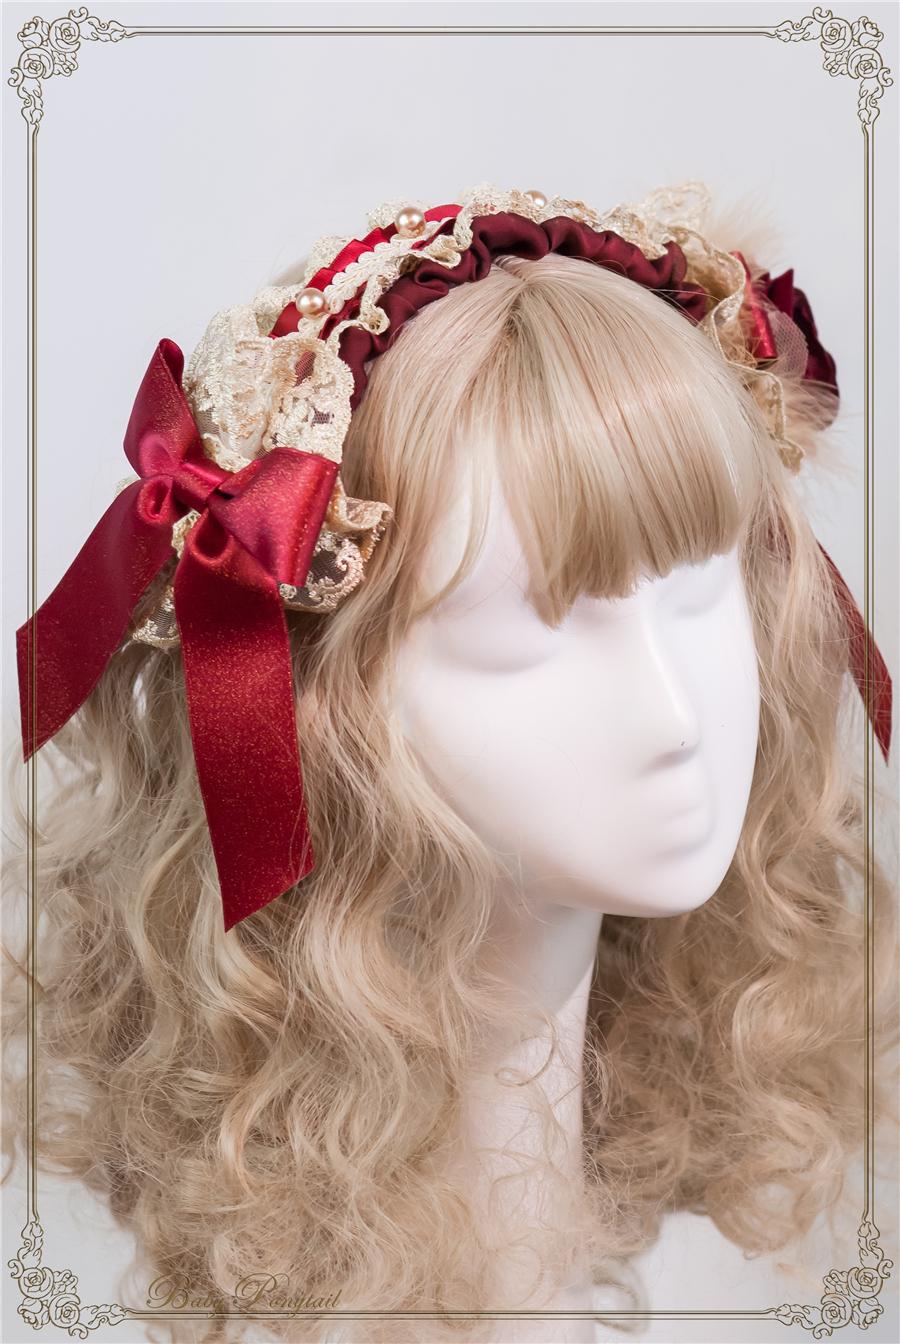 Baby Ponytail_Stock photo_Circus Princess_Rose Head Dress Red_01.jpg